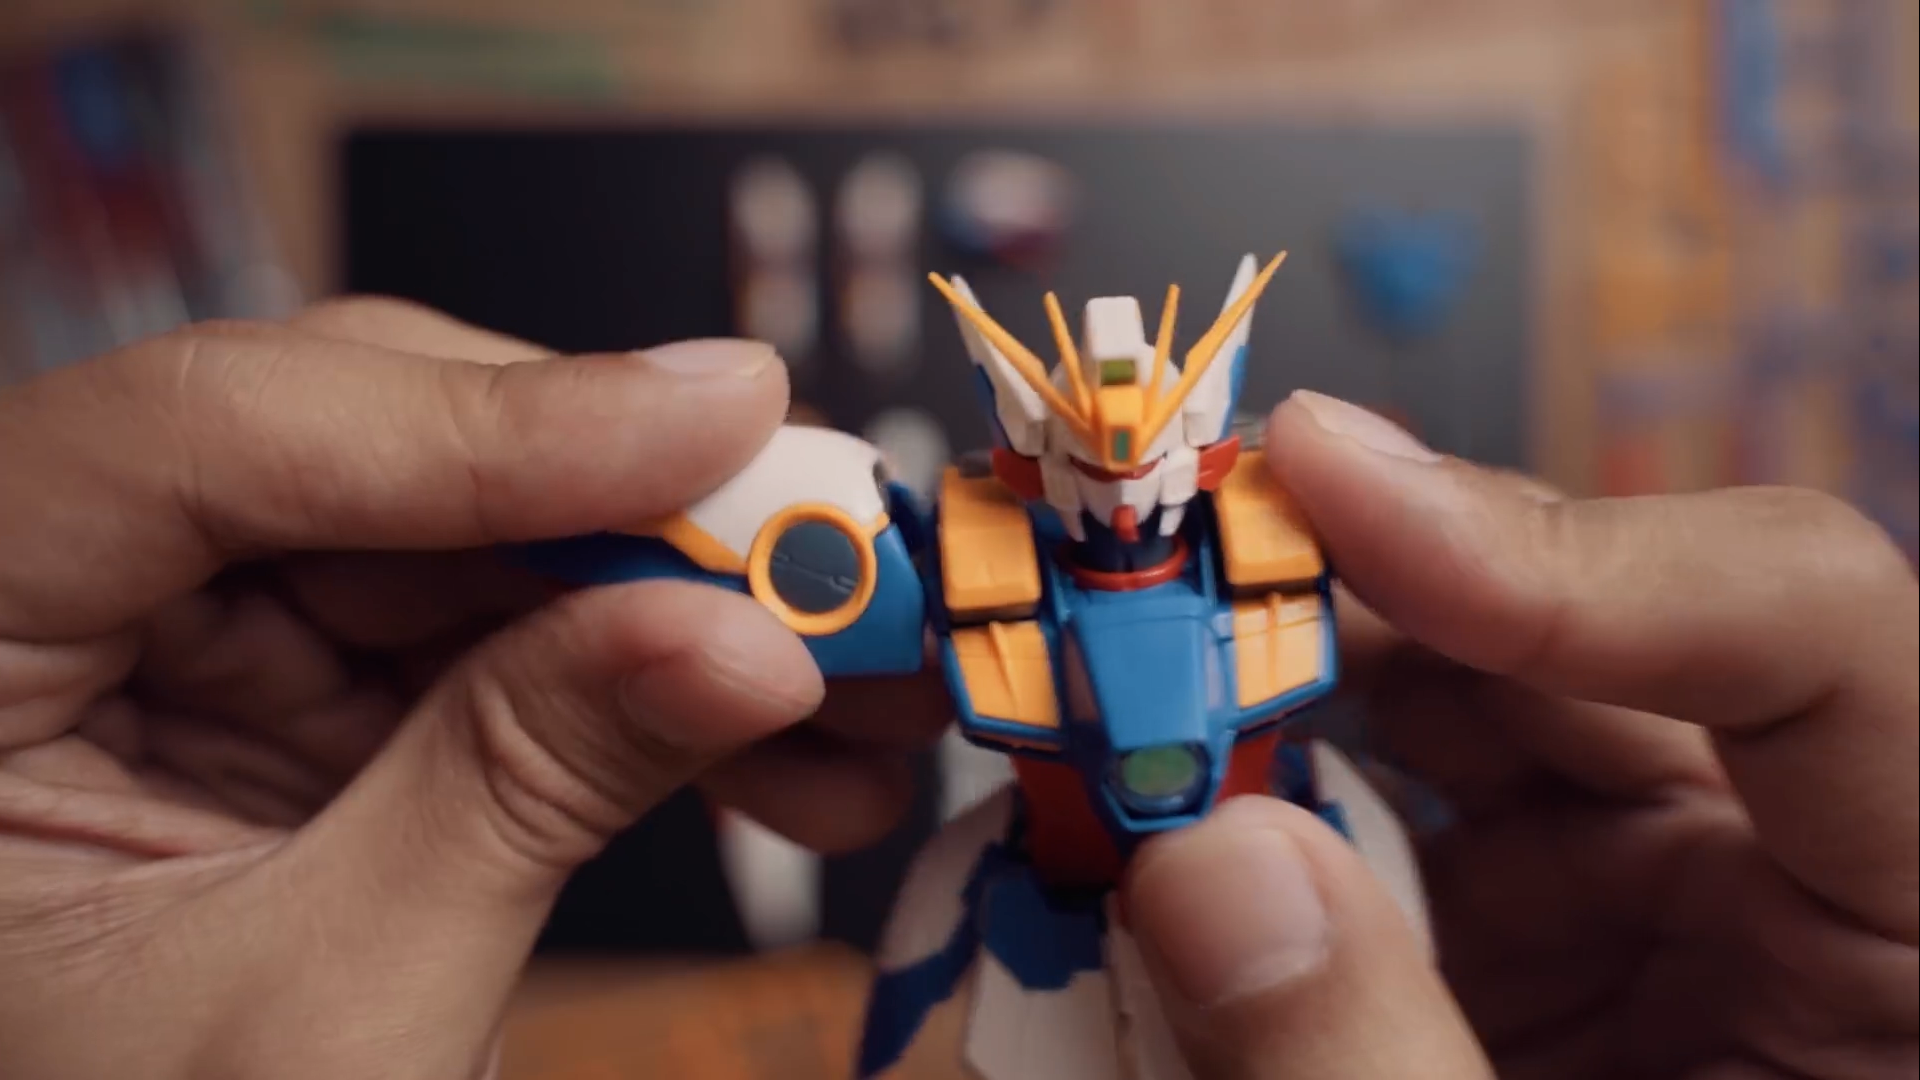 Wing-Gundam-Ver.Ka-MG-Noob-builds-a-Gunpla-0-03-39-23314